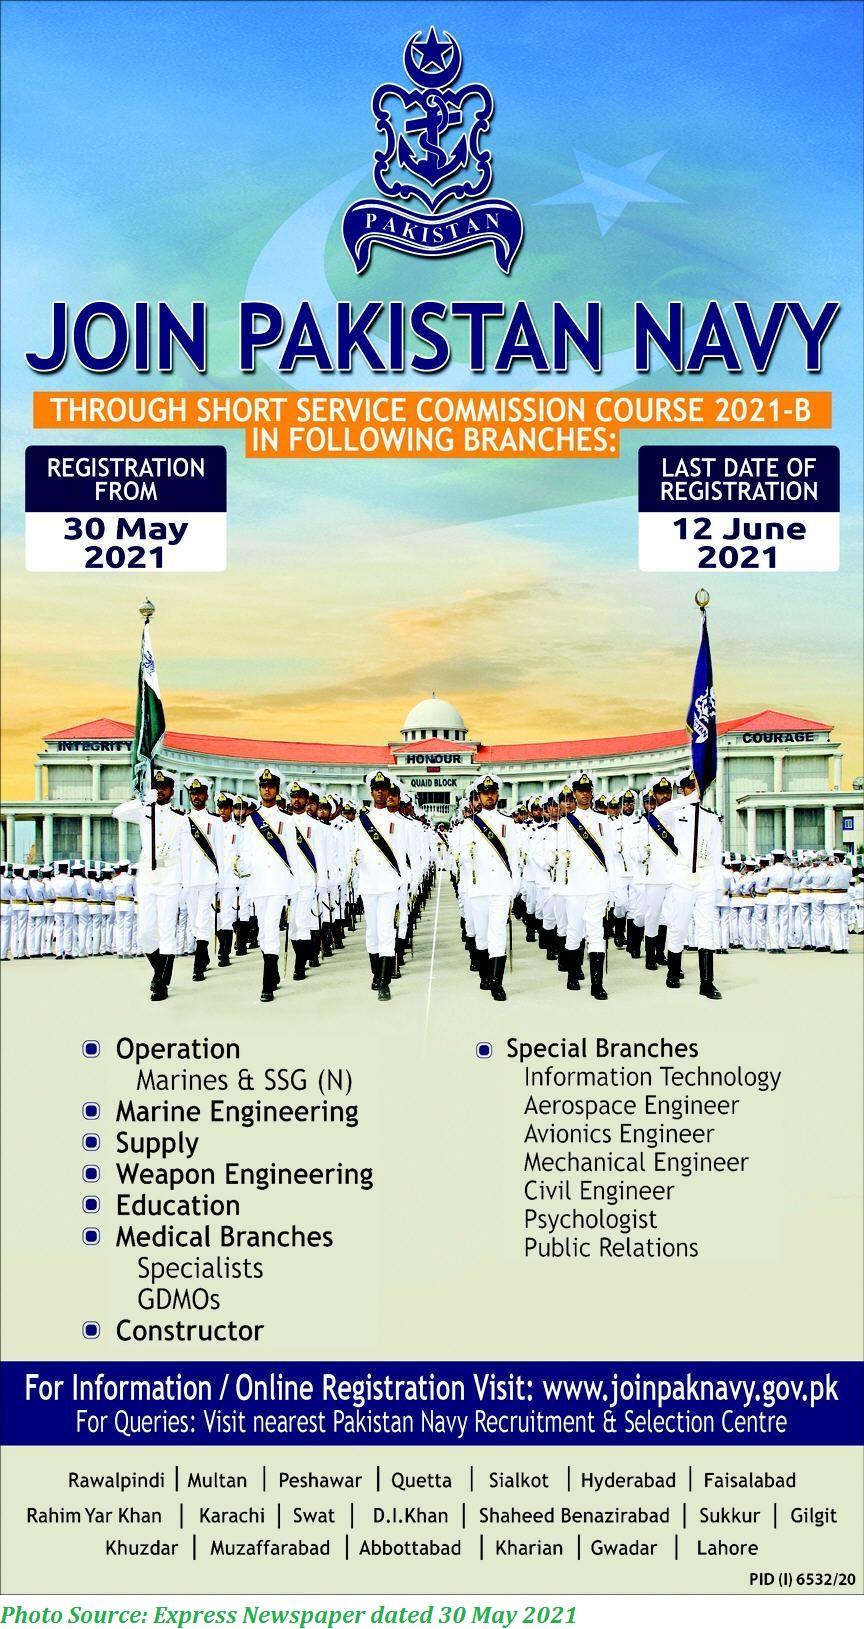 Join Pak Navy 2021 Short Service Commission Course 2021-B Apply Online www.joinpaknavy.gov.pk